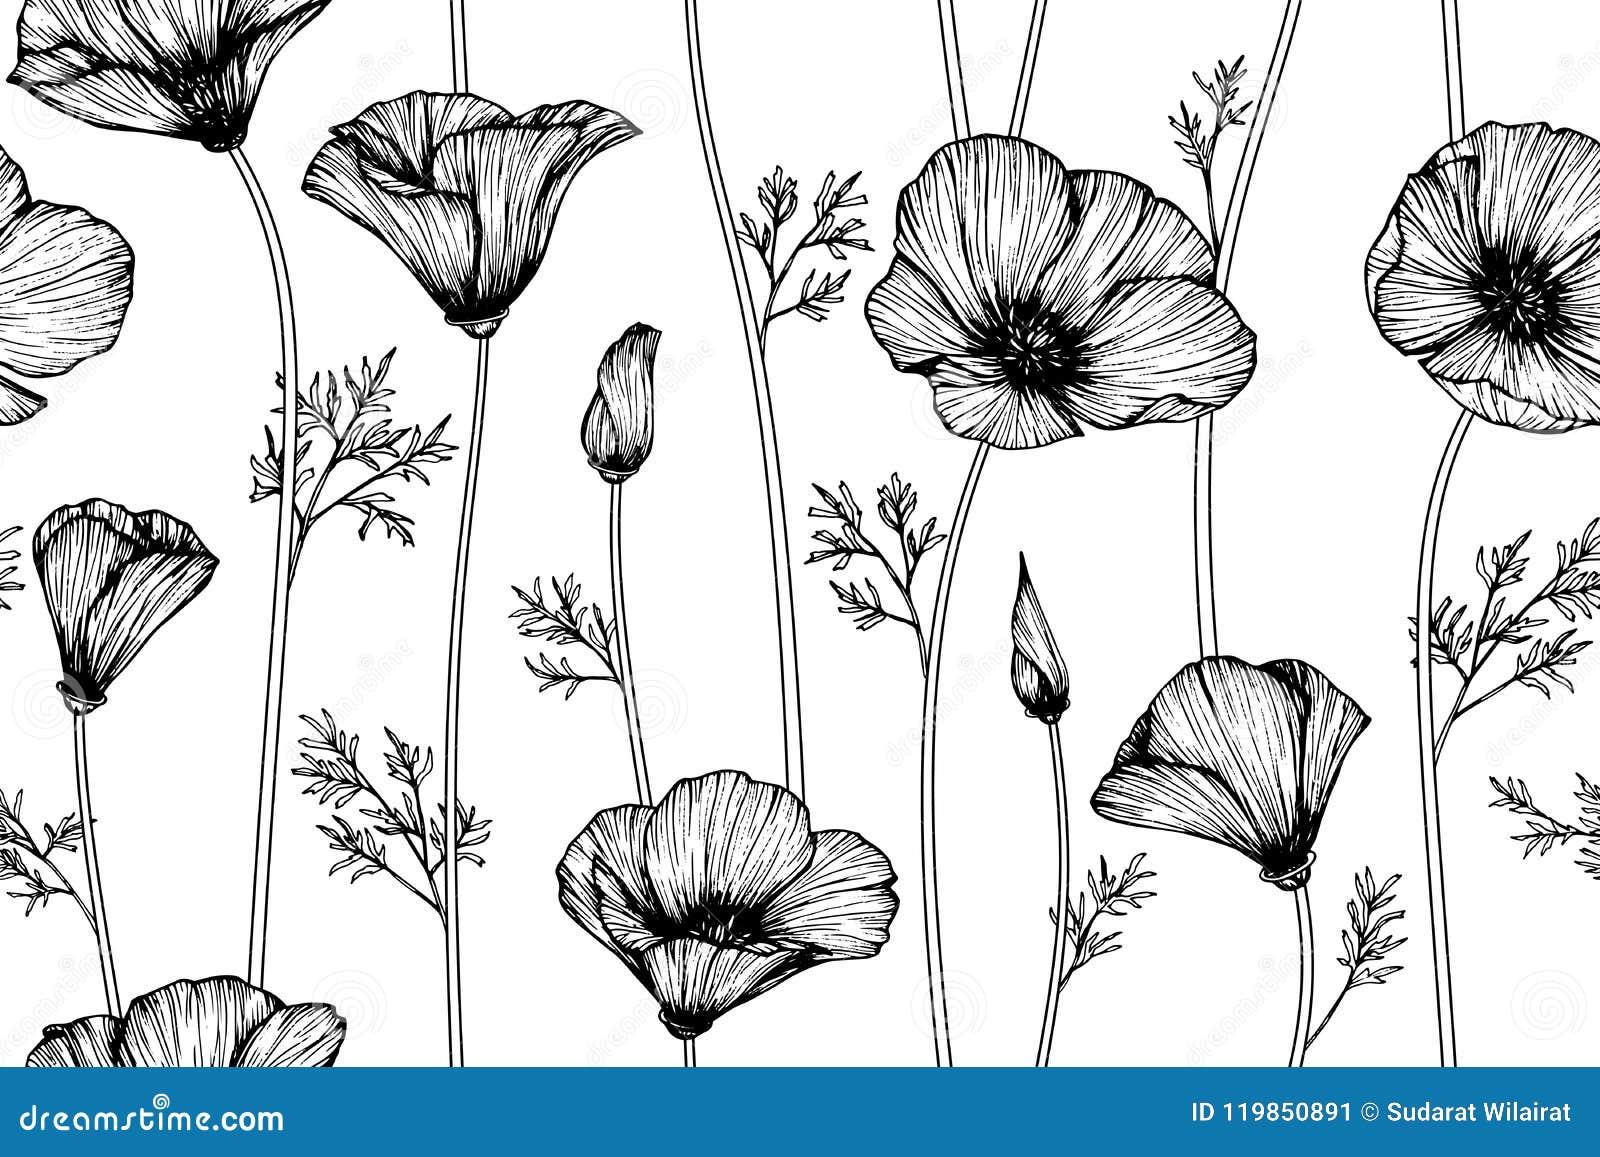 Seamless california poppy flower pattern background stock download seamless california poppy flower pattern background stock illustration illustration of anemone beauty mightylinksfo